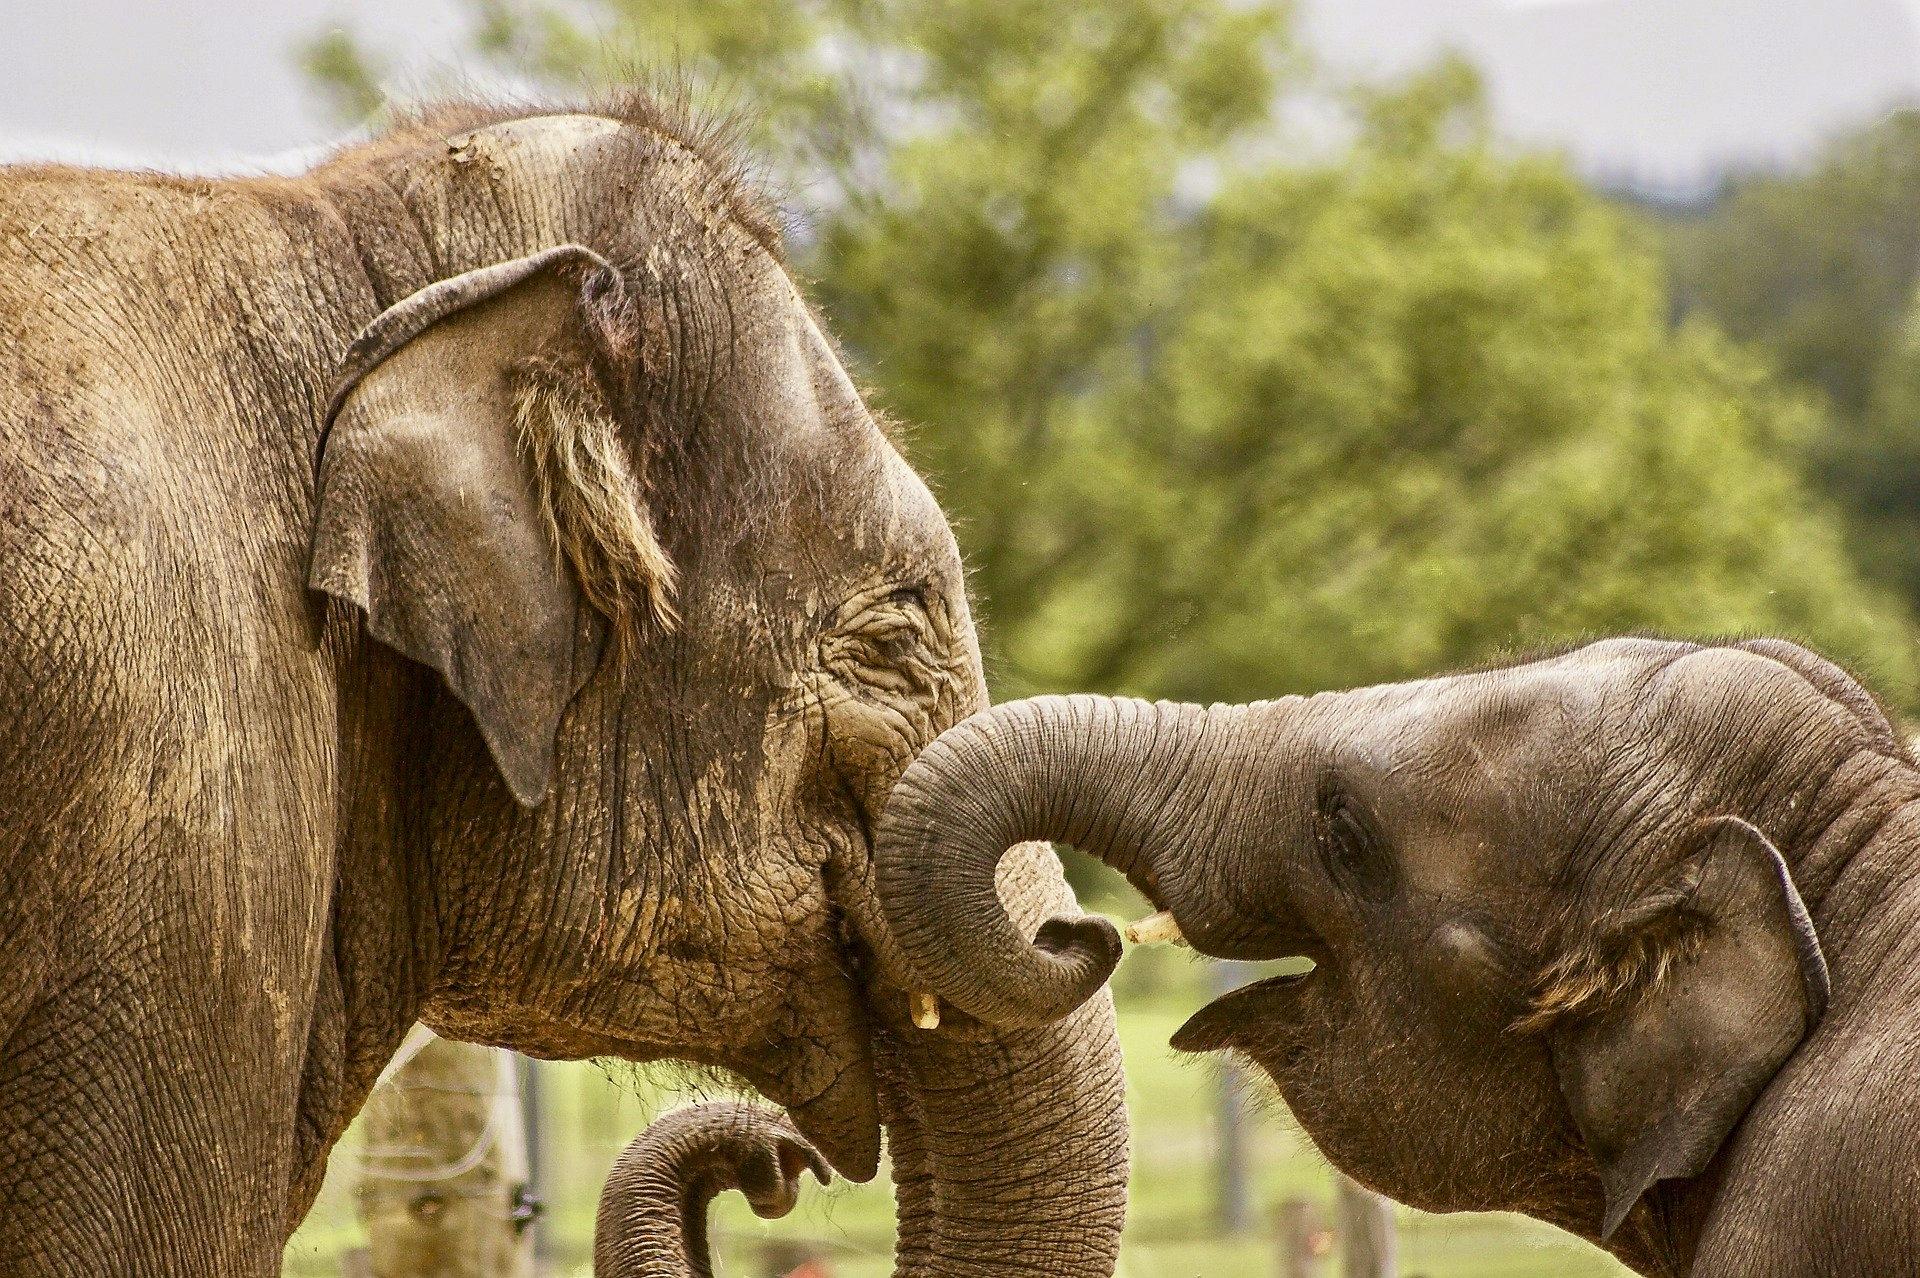 elephants_asie_thailande_bebe_maman_famille_jeu_trompe